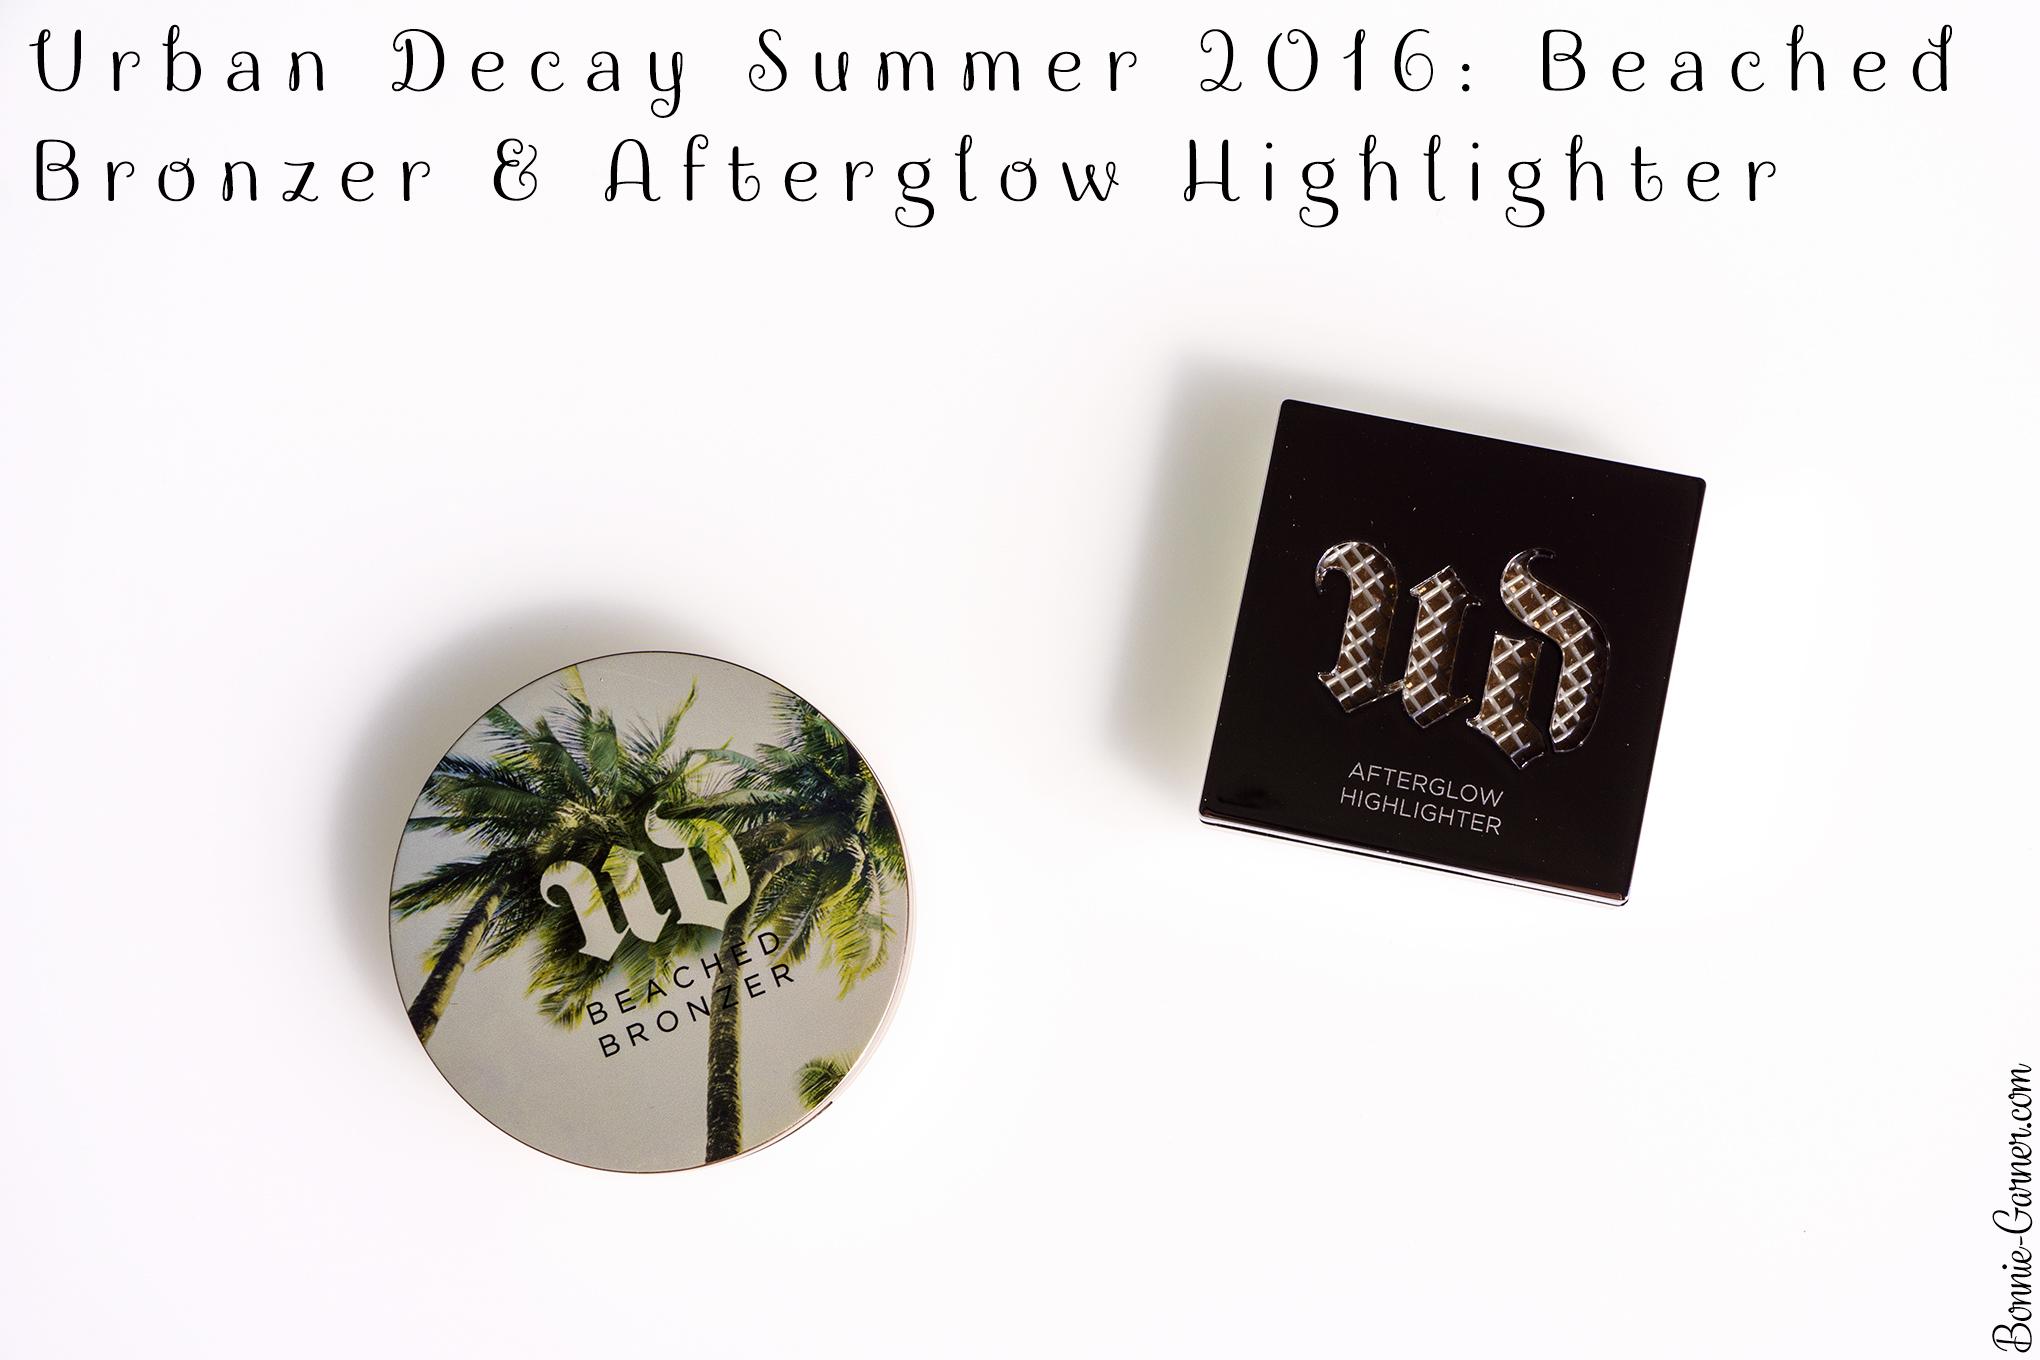 Urban Decay Summer 2016: Beached Bronzer & Afterglow Highlighter